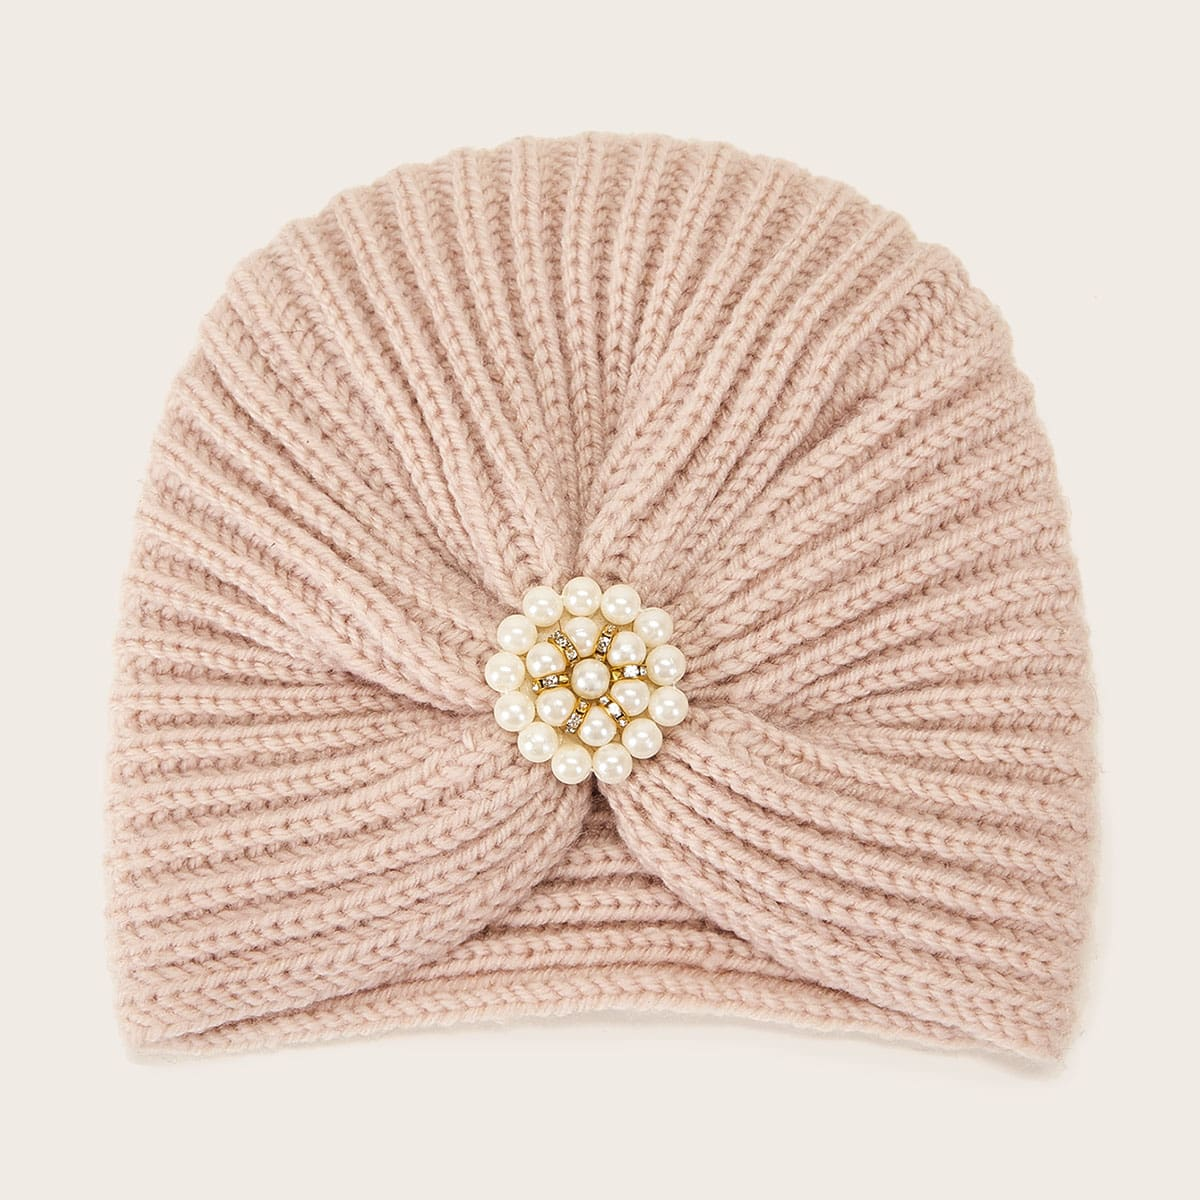 Faux Pearl Decor gebreide tulband hoed